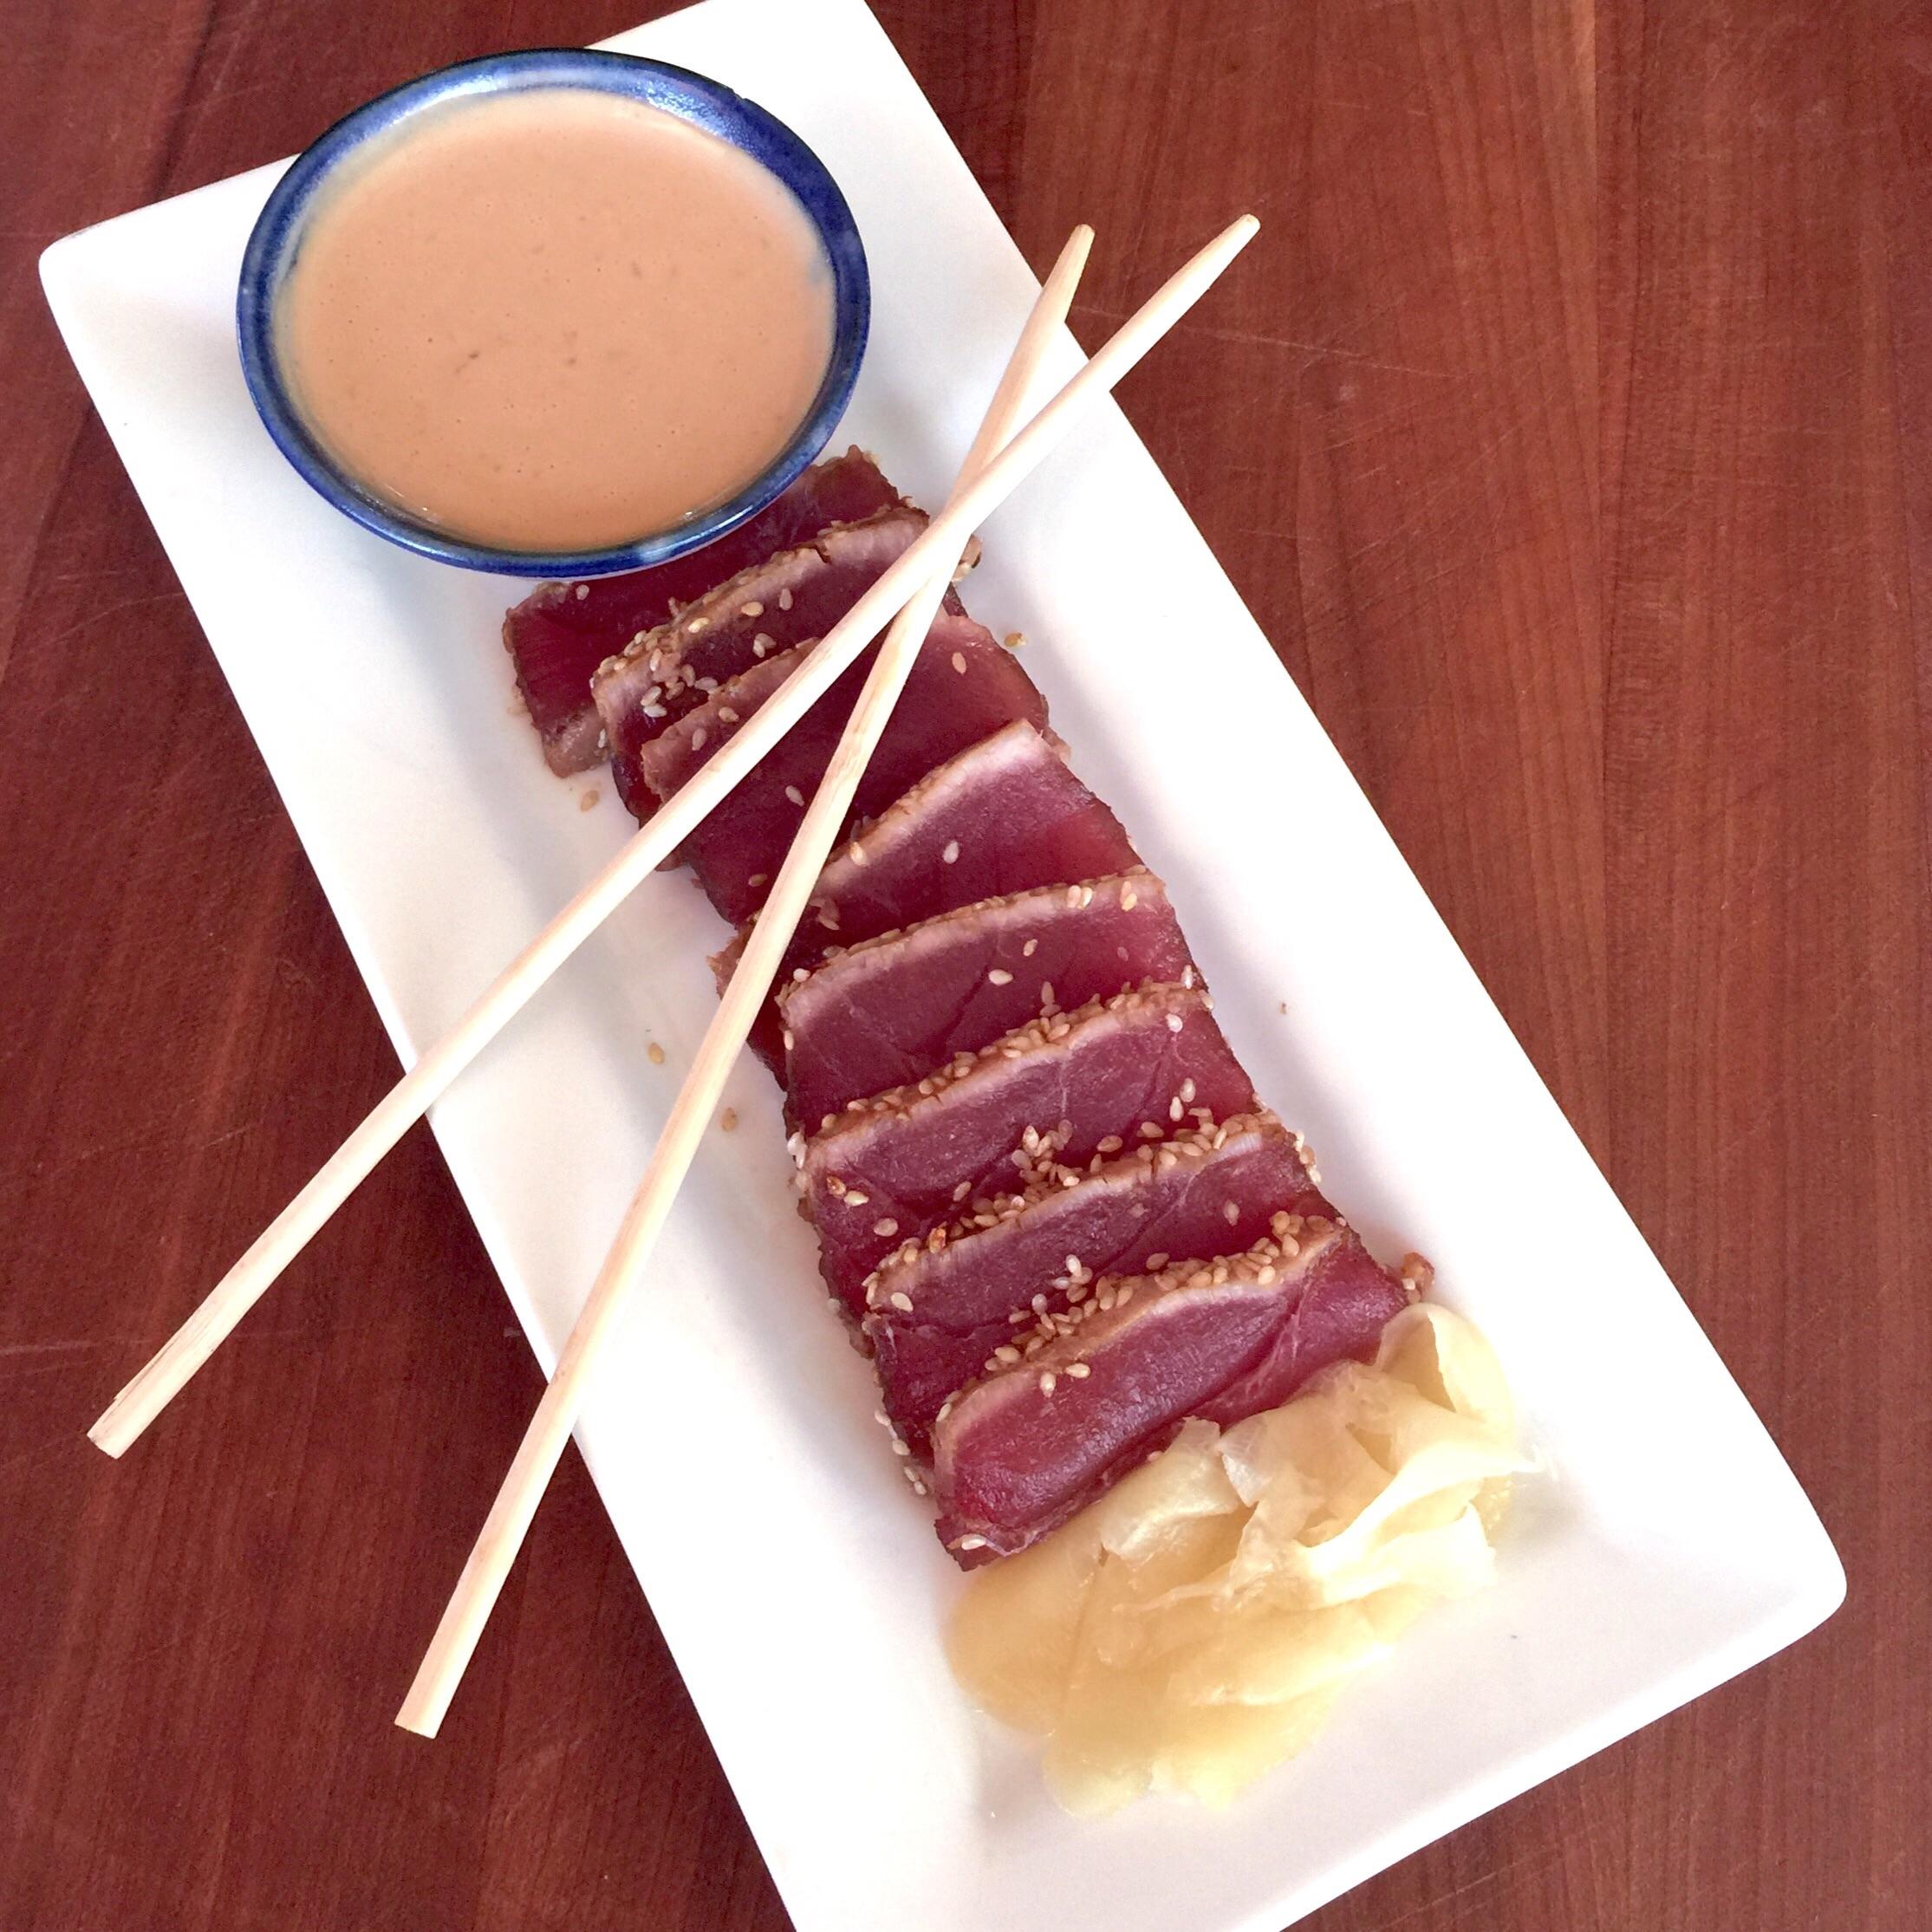 seared ahi tuna with chili garlic ginger dipping sauce